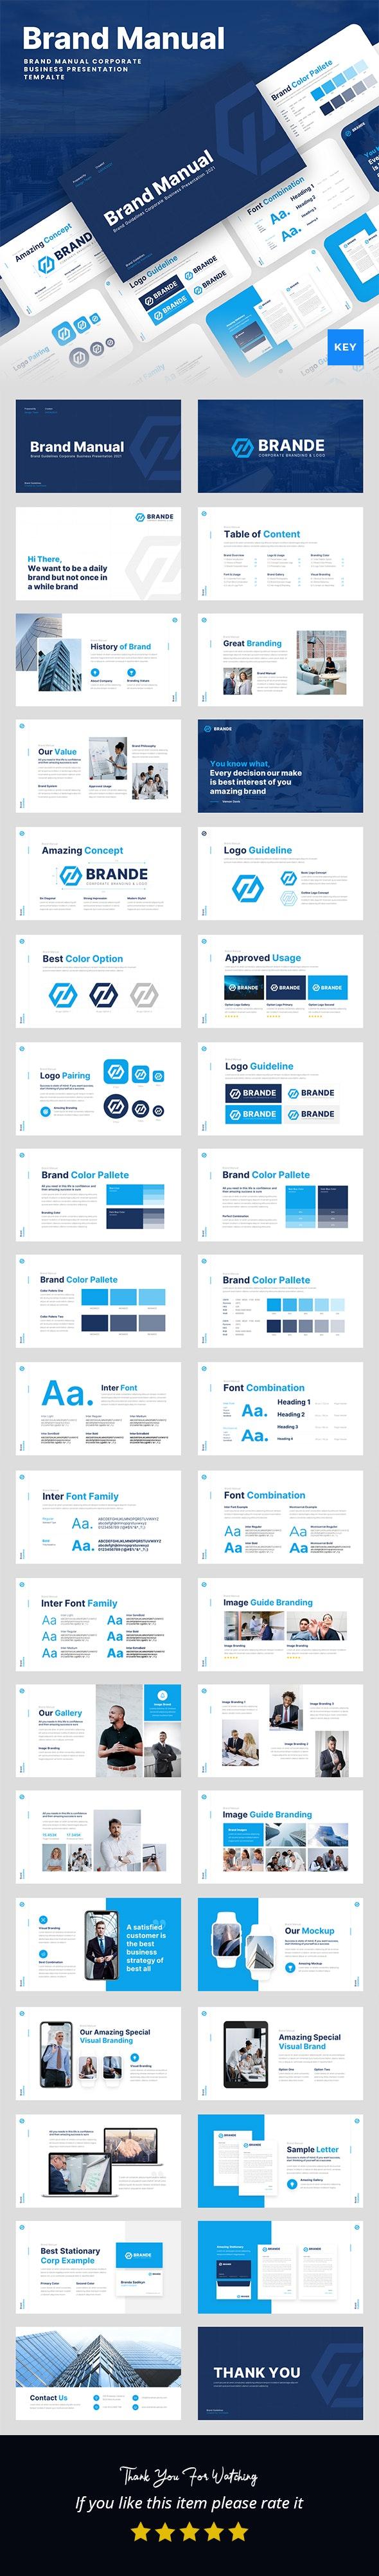 Brand Manual Keynote Presentation Template - Business Keynote Templates